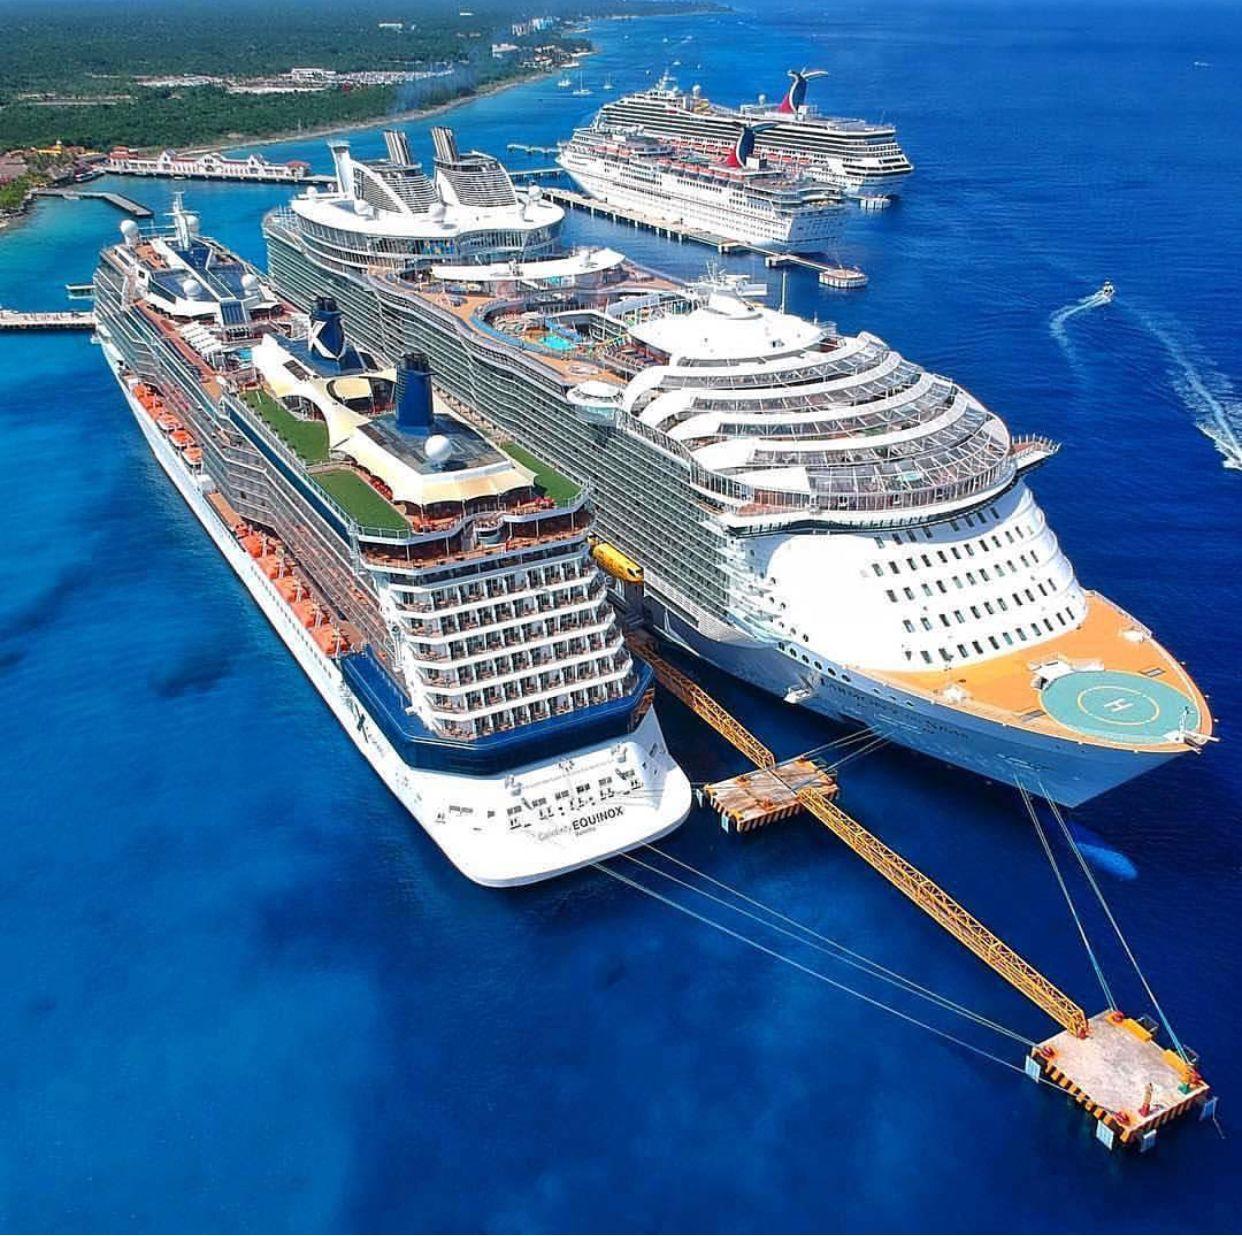 Celebrity Equinox And Harmony Of The Seas Cruise Ship Caribbean Cruise Cruise Travel [ jpg ]